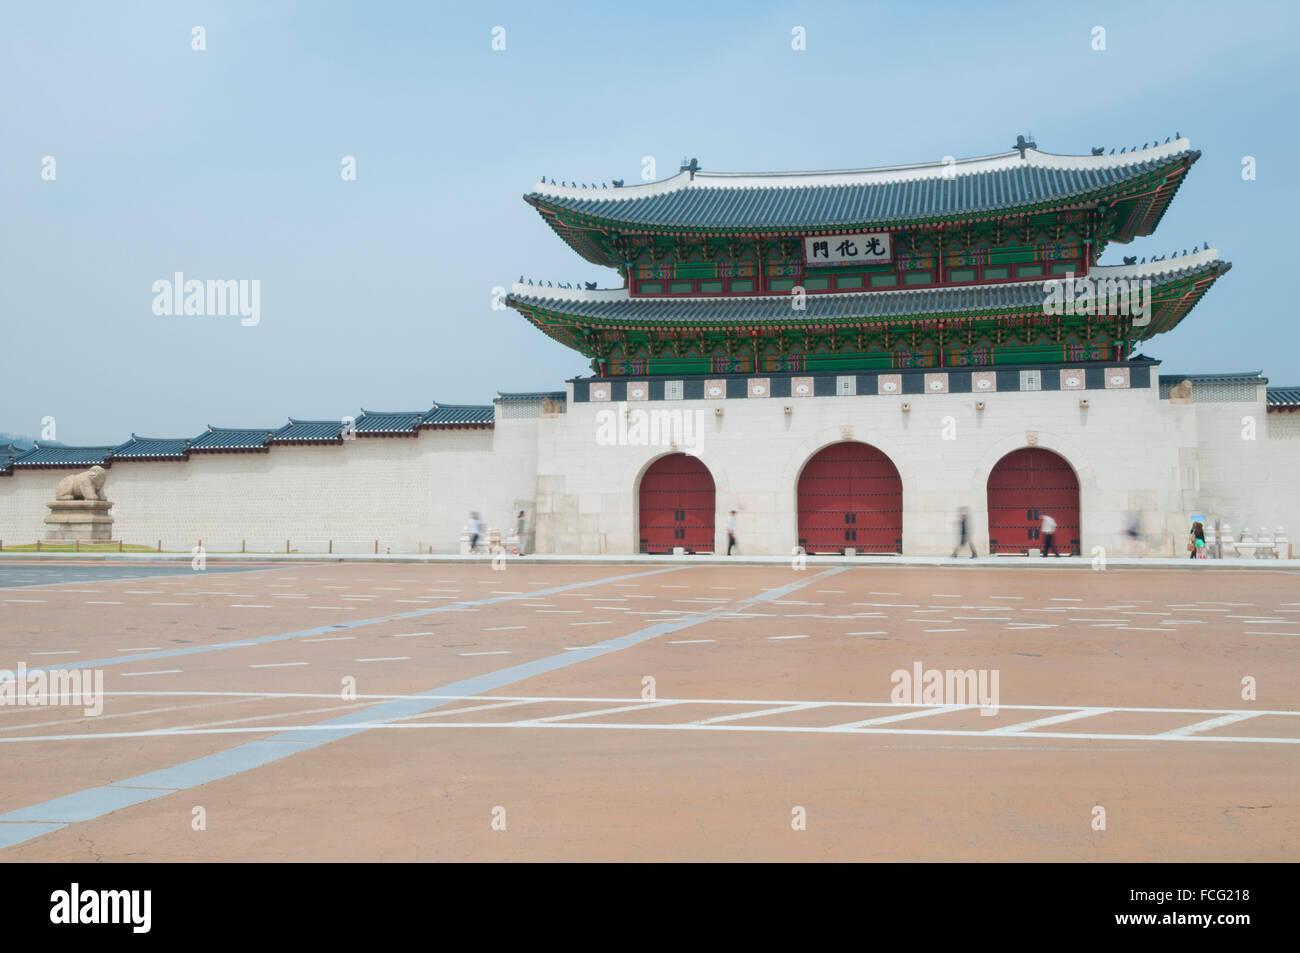 Gwanghwamun, main gate, Gyeongbokgung Palace, Jongno-gu, Seoul, South Korea Stock Photo